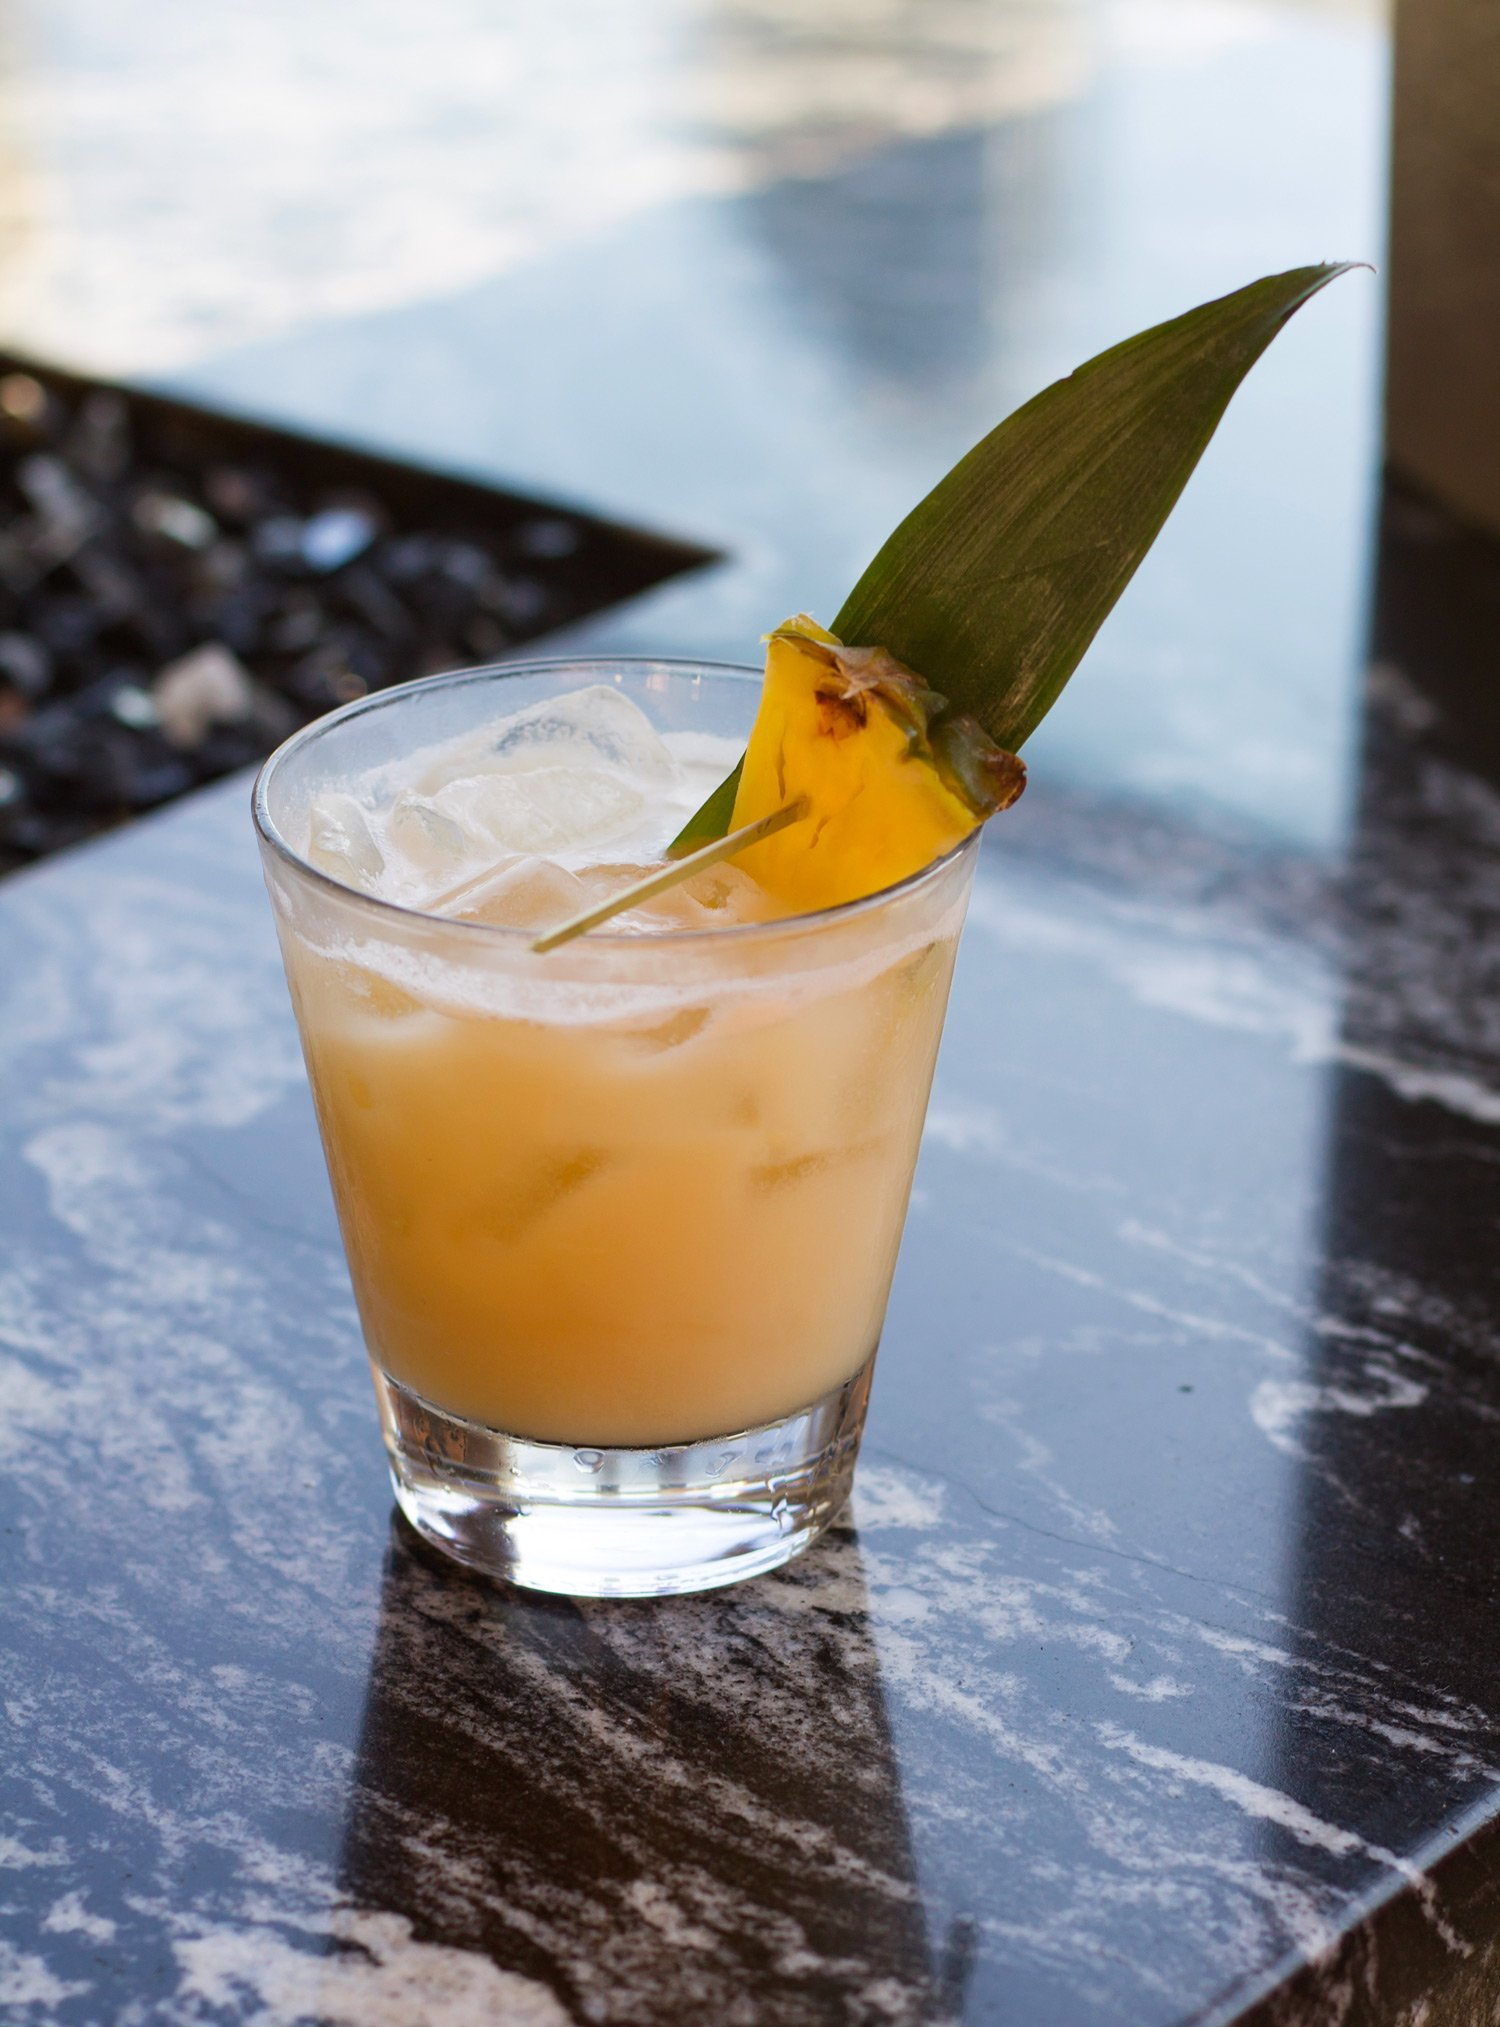 The Caribe Colada